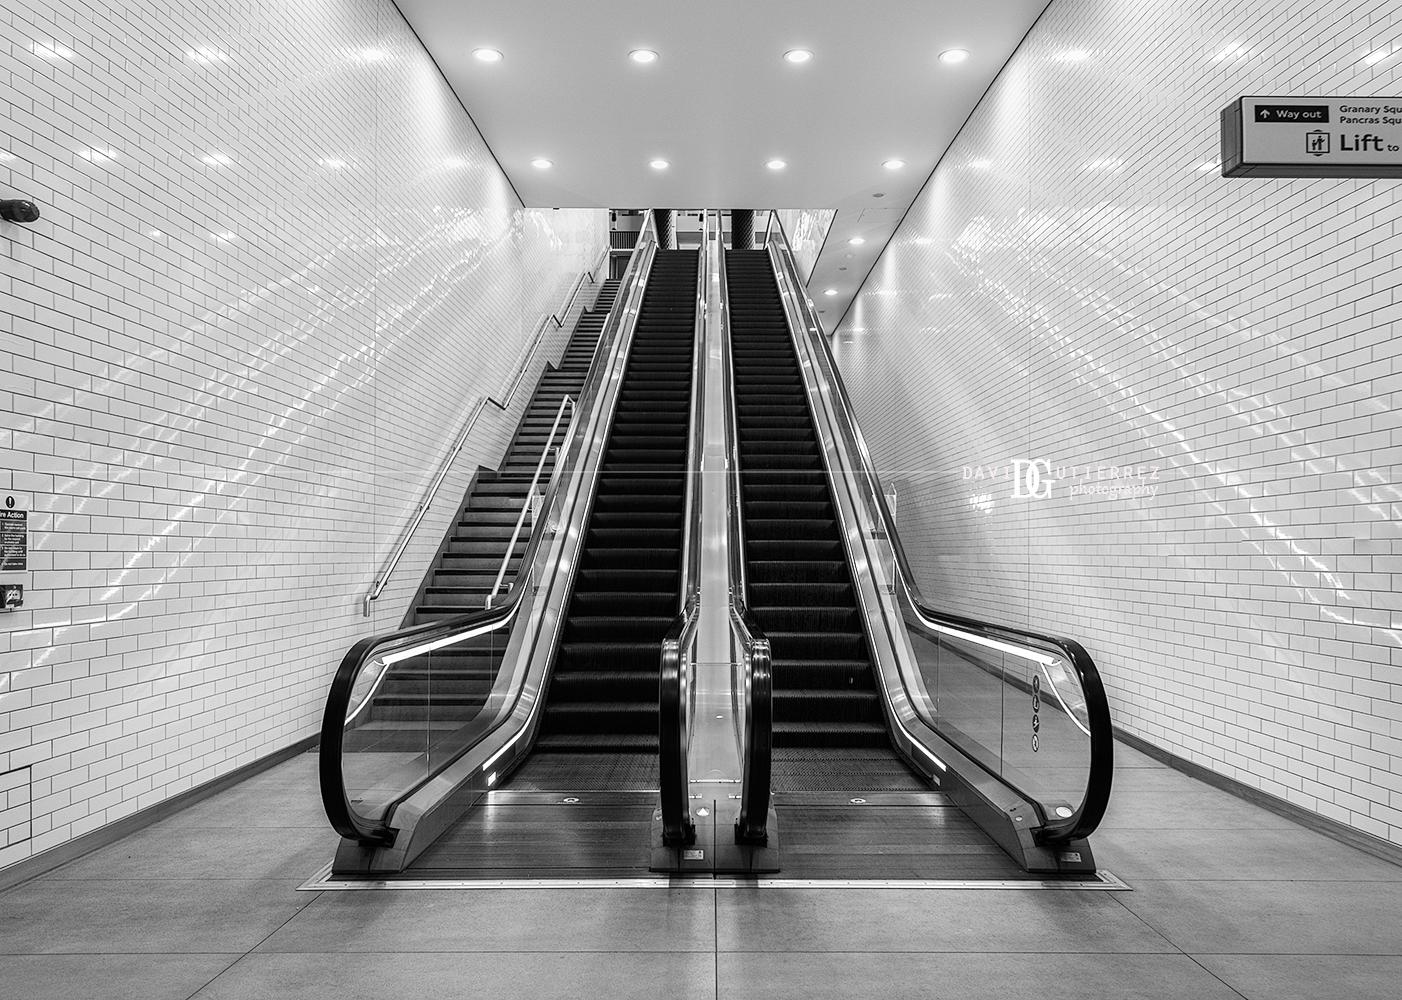 """Escalation II"" King's Cross St. Pancras Station, London, United Kingdom by David Gutierrez Photography, London Photographer"